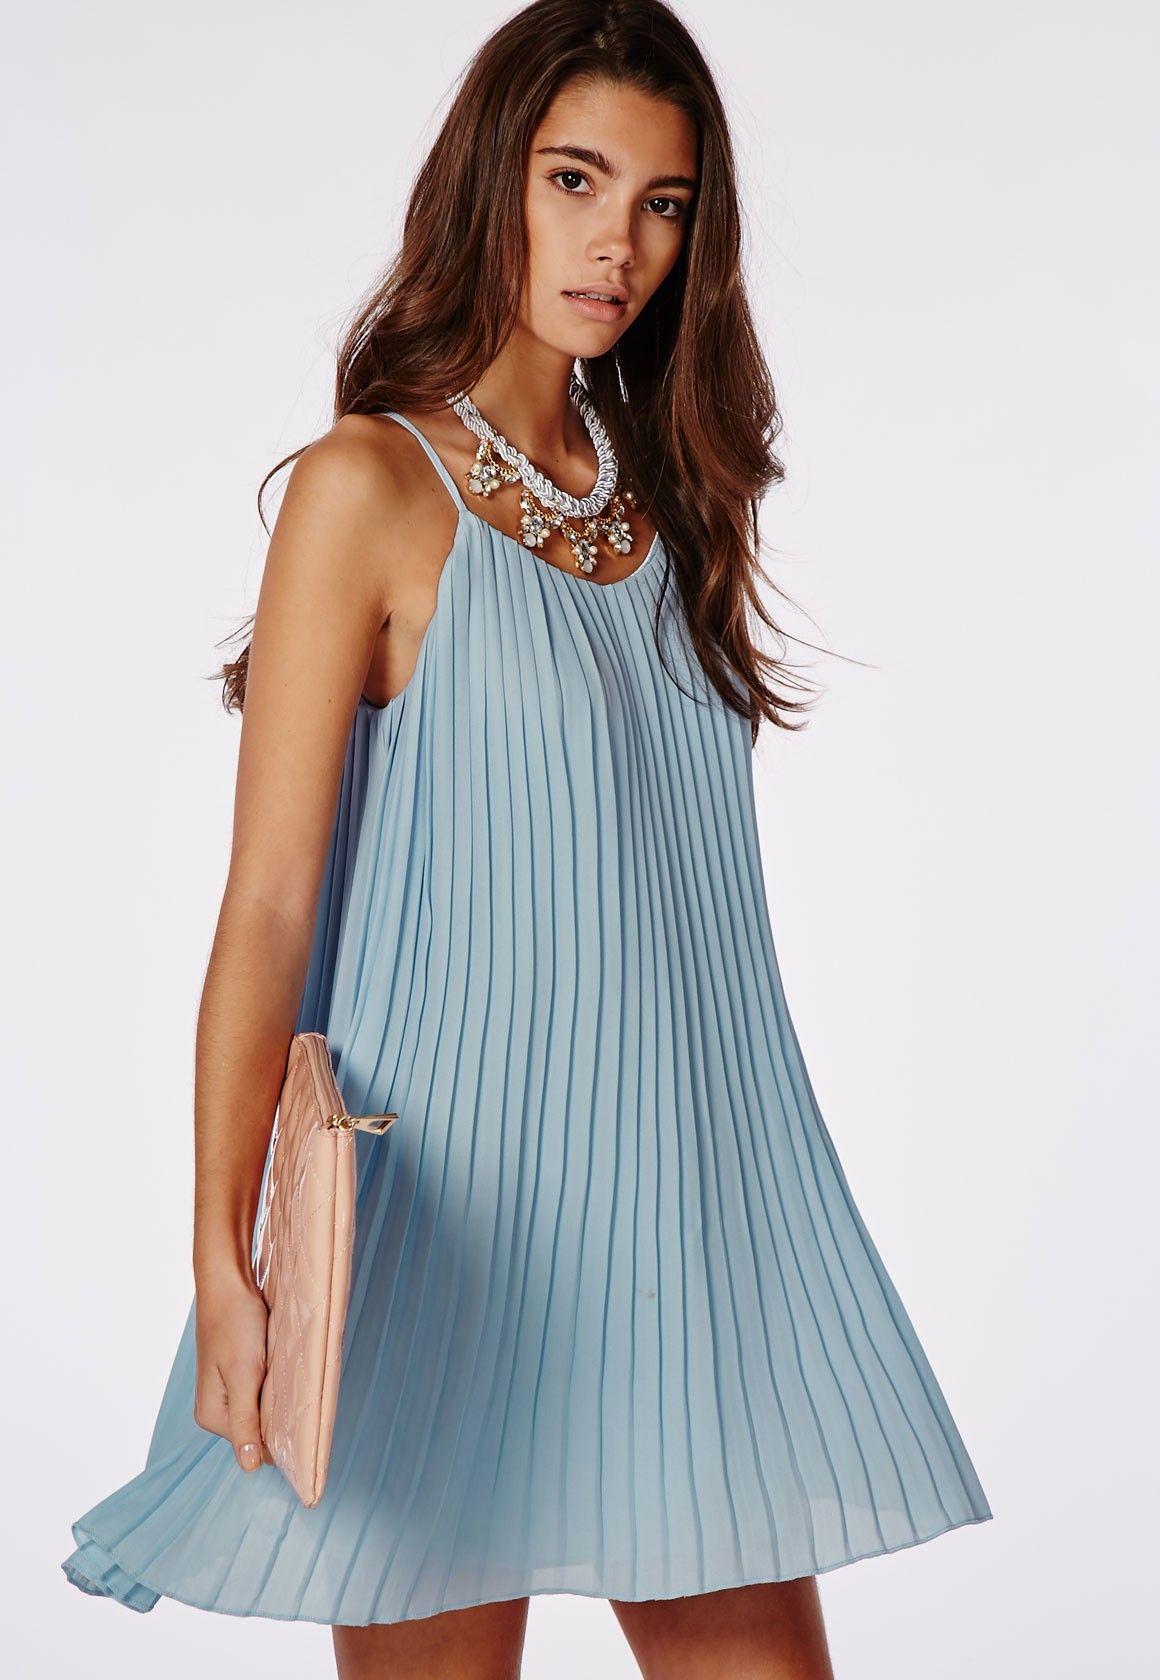 Missguided - Chiffon Pleated Swing Dress Powder Blue | Let's go ...